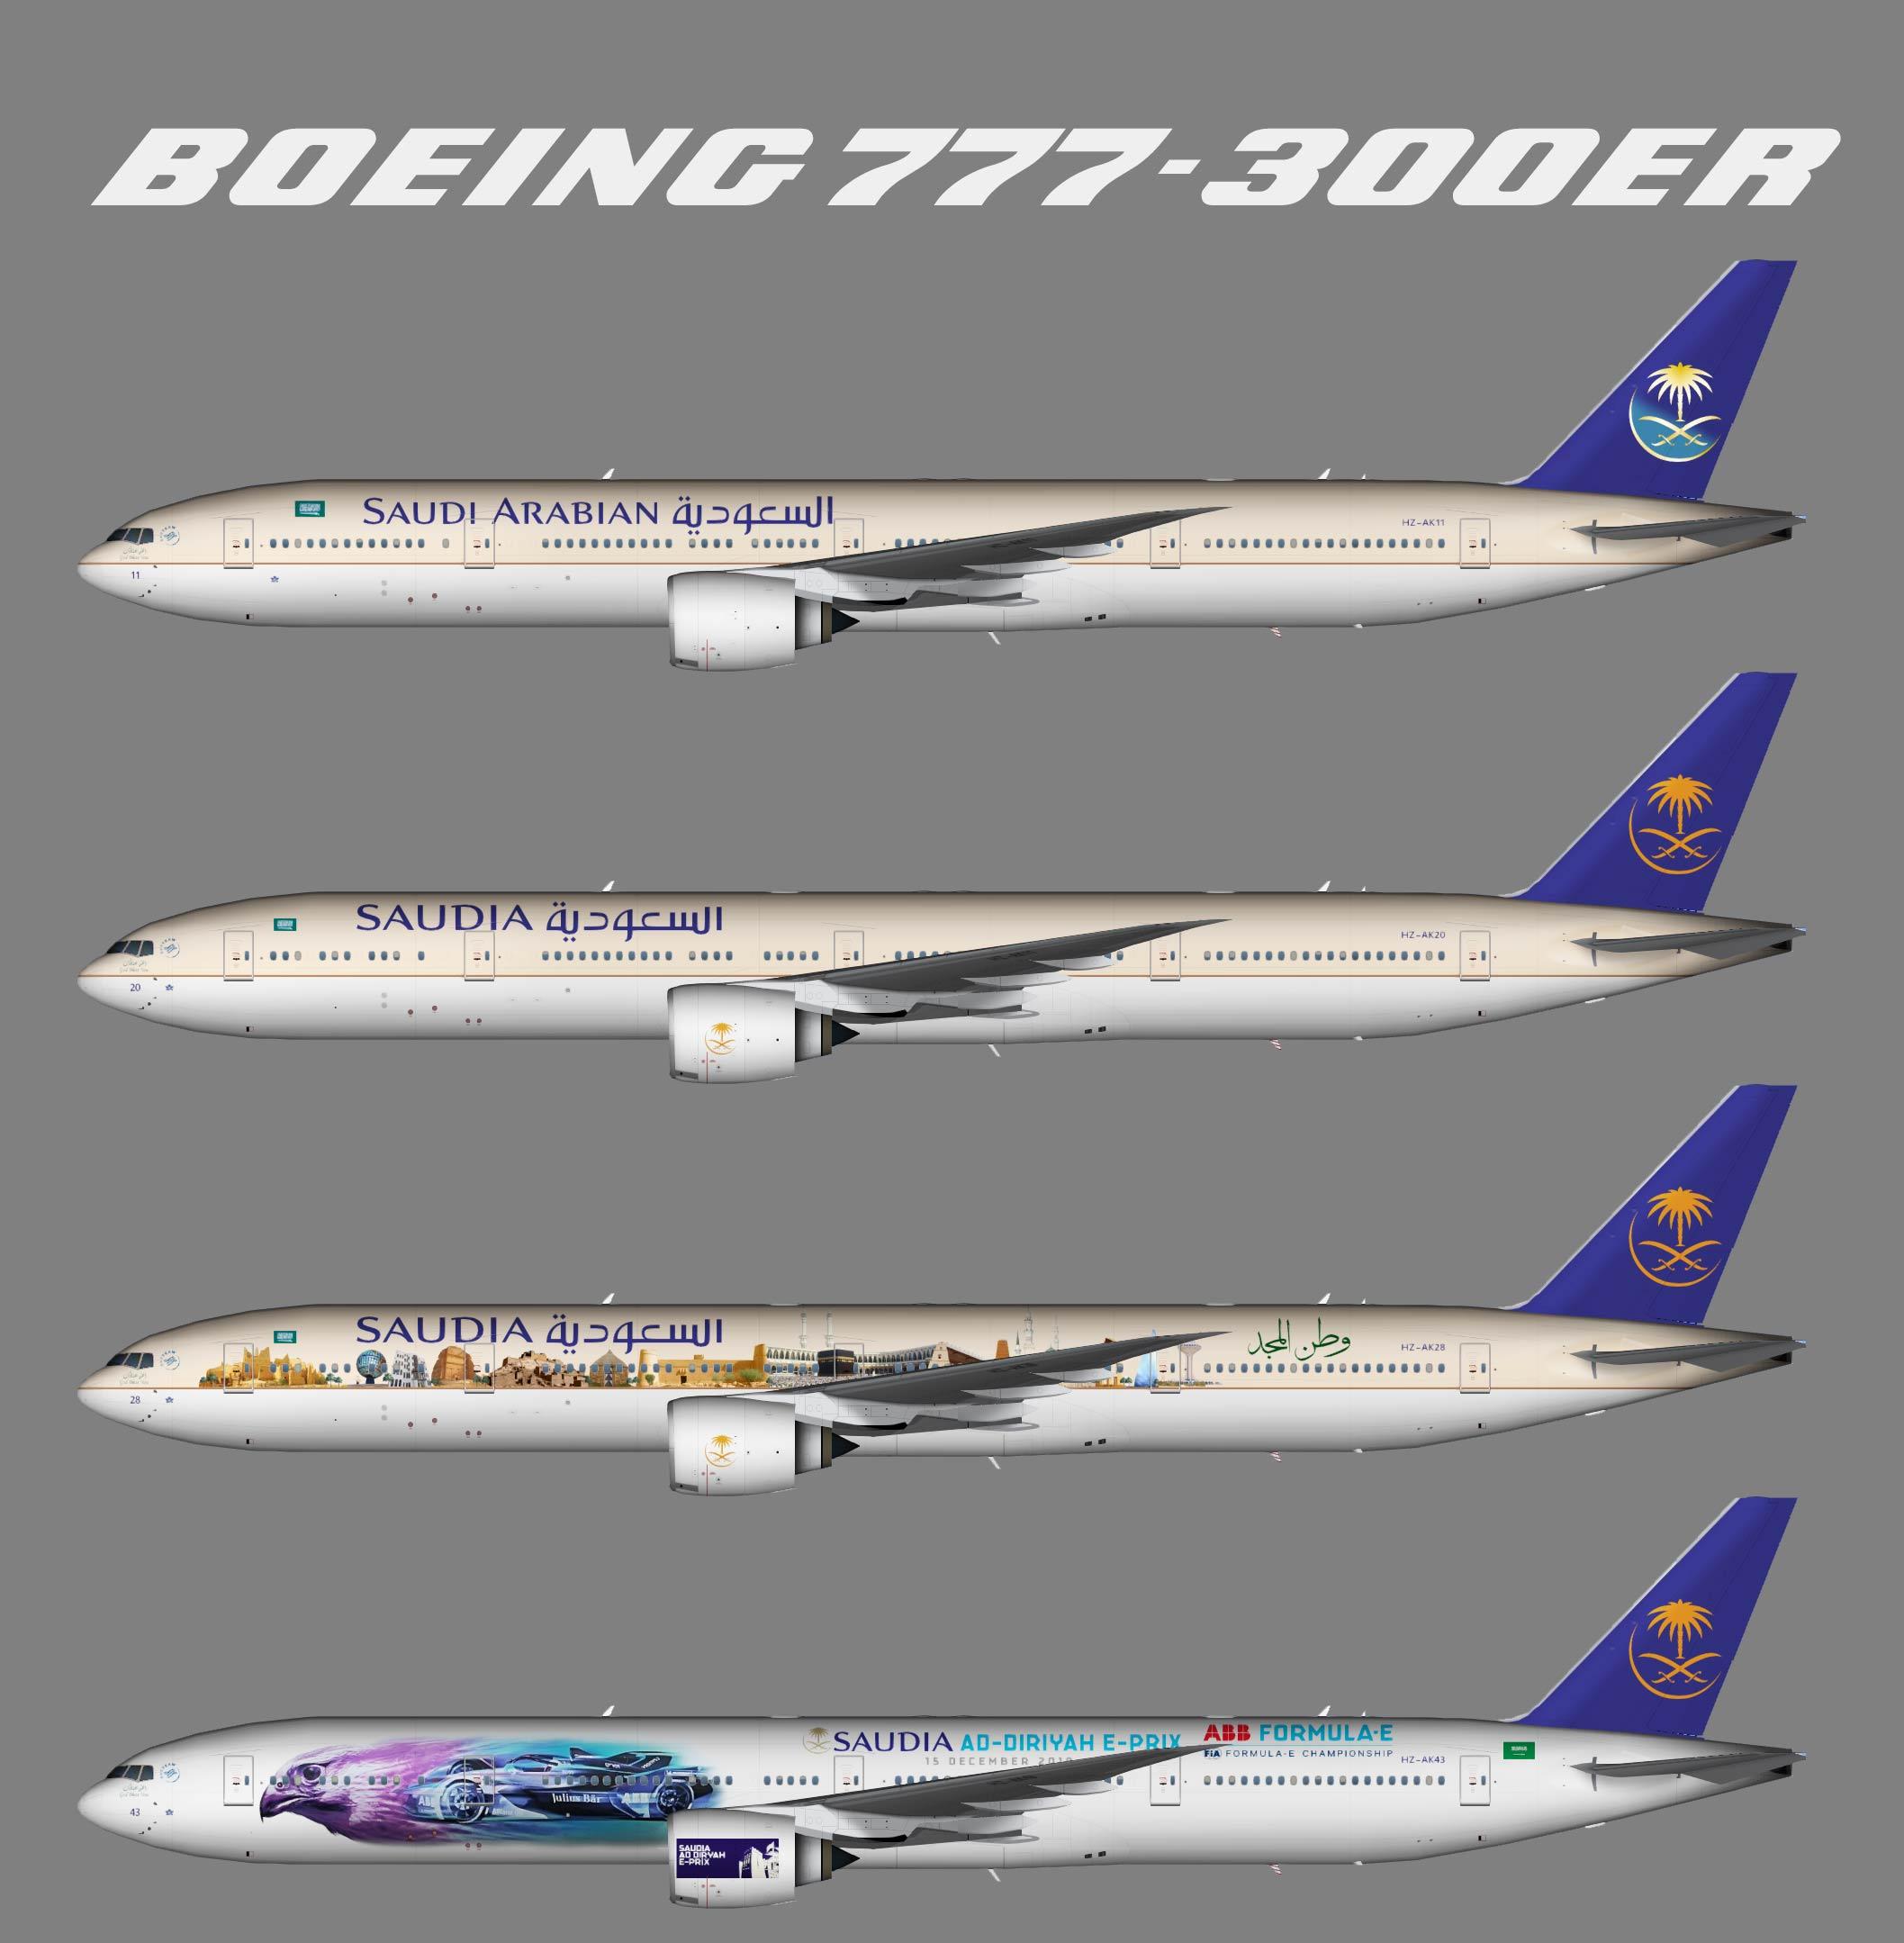 Saudia Boeing 777-300ER – Juergen's paint hangar